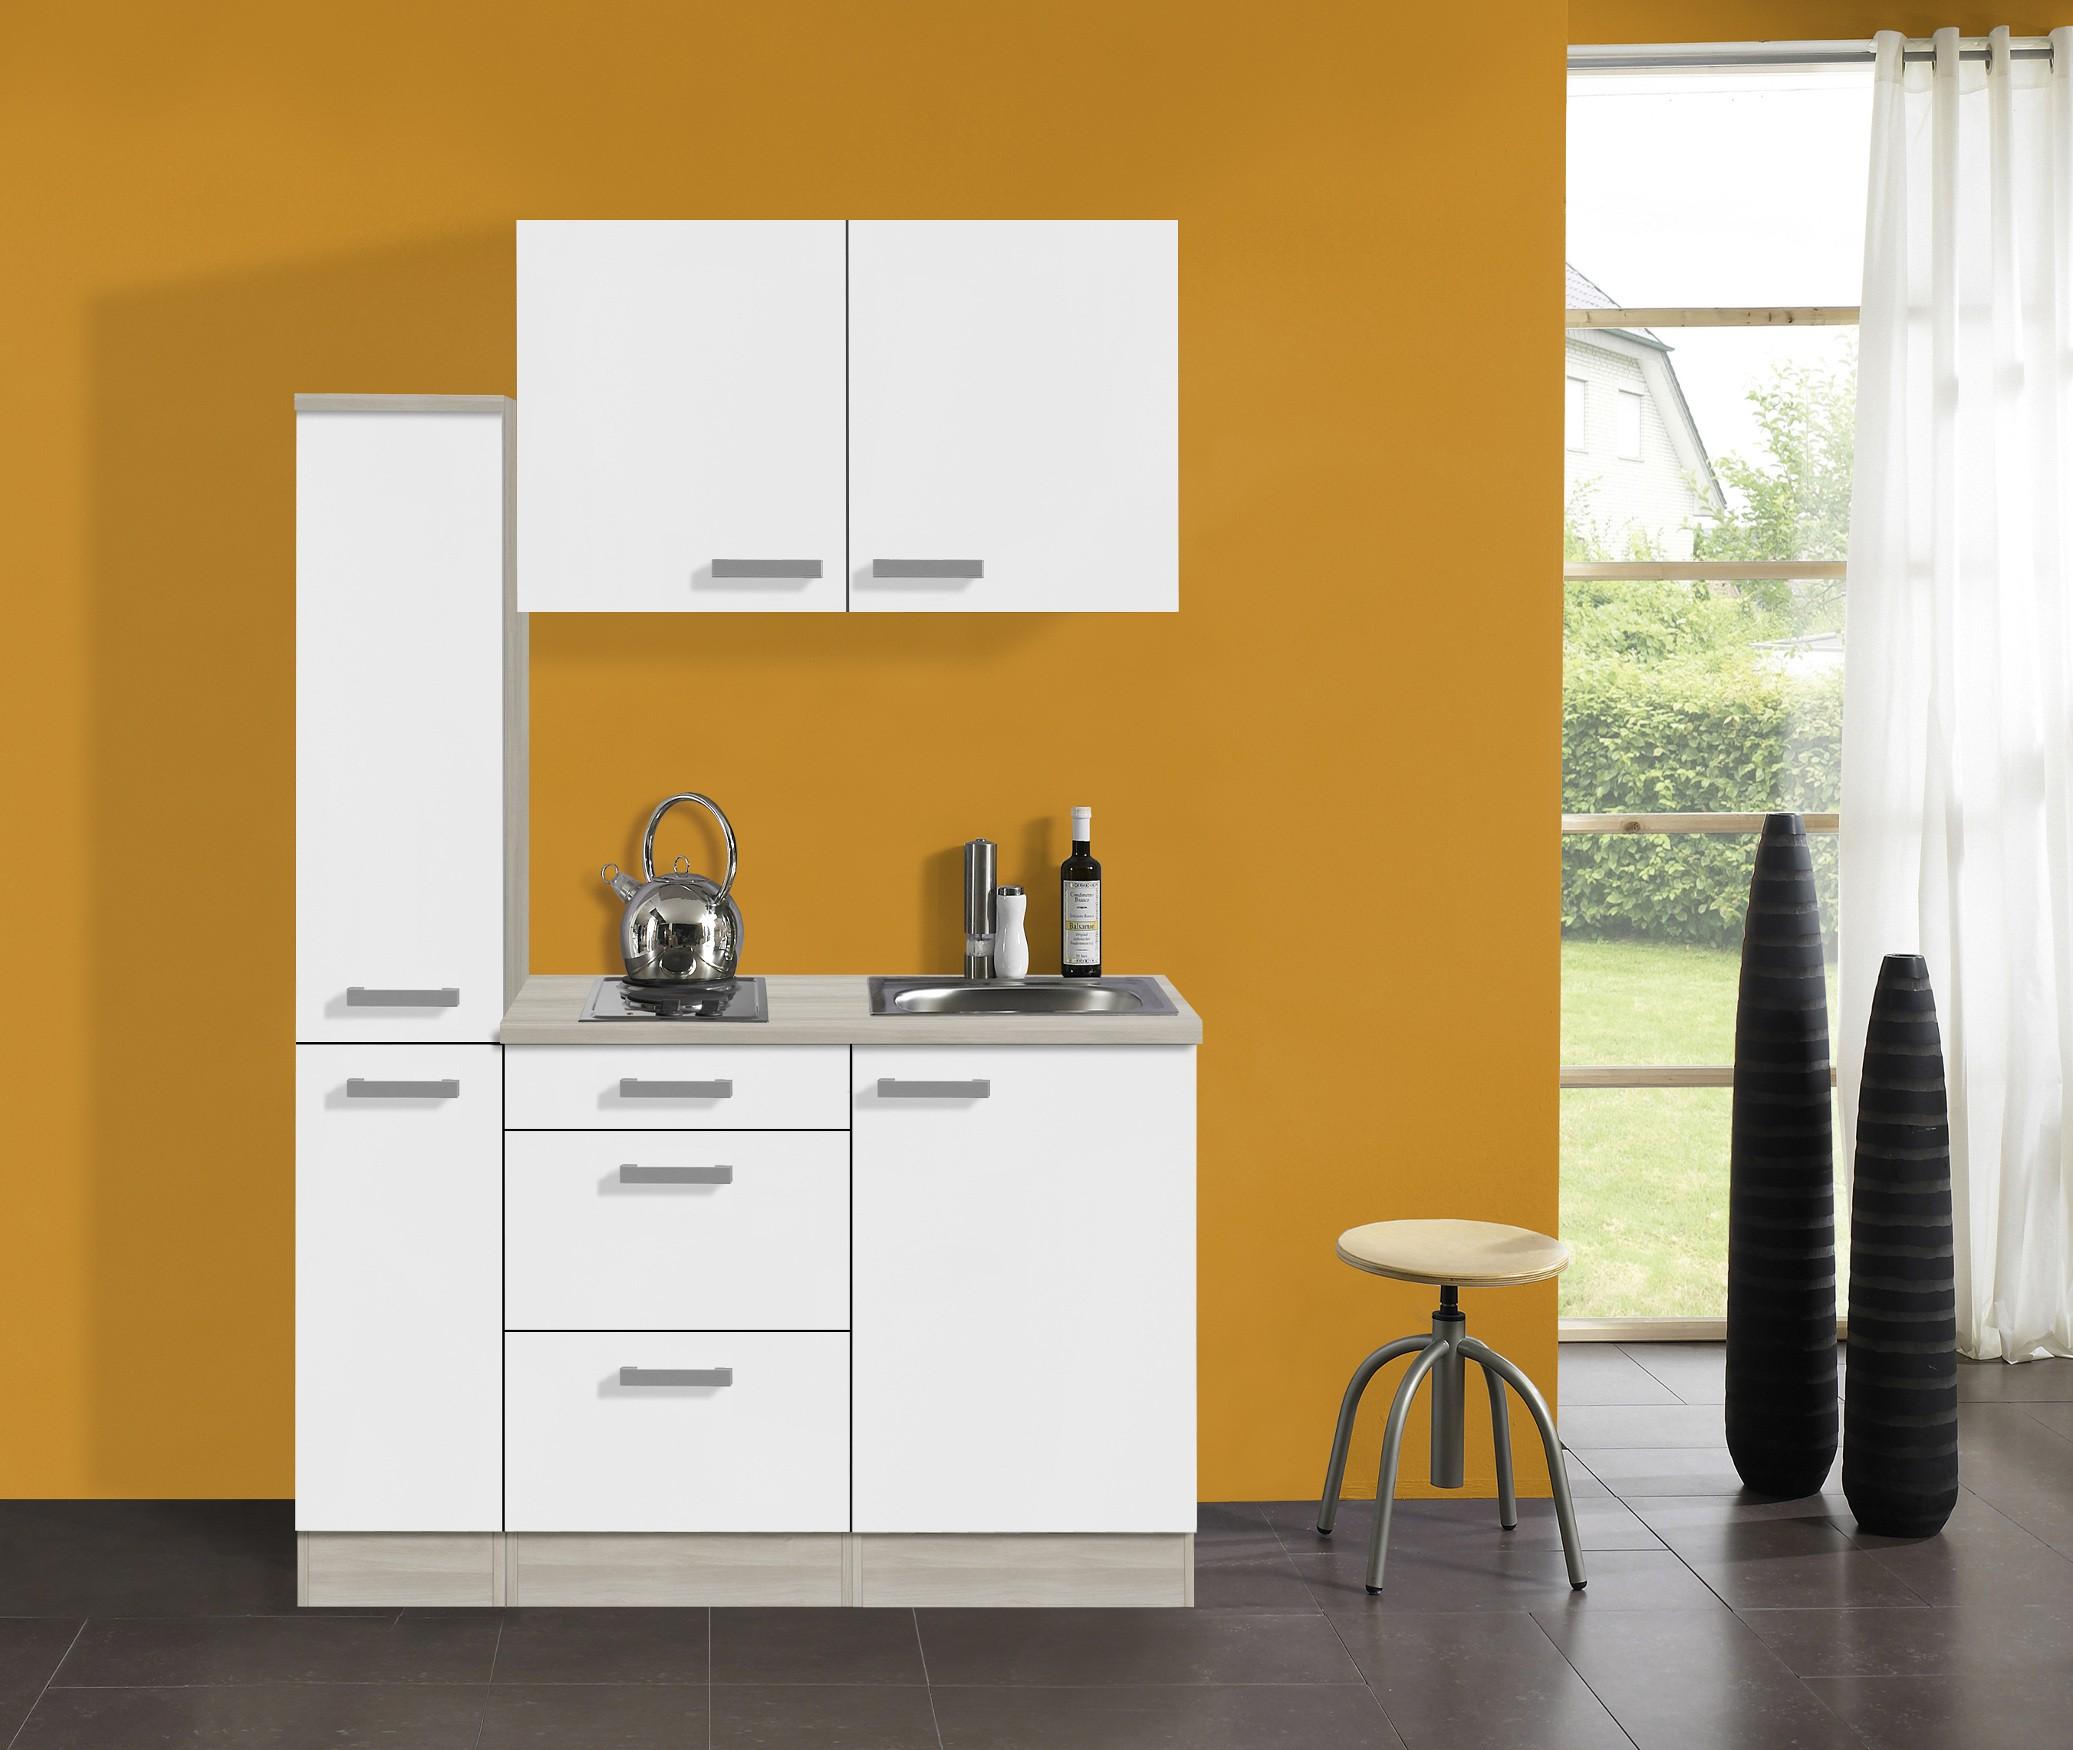 singlek che barcelona mit elektro kochfeld breite 130 cm wei k che. Black Bedroom Furniture Sets. Home Design Ideas